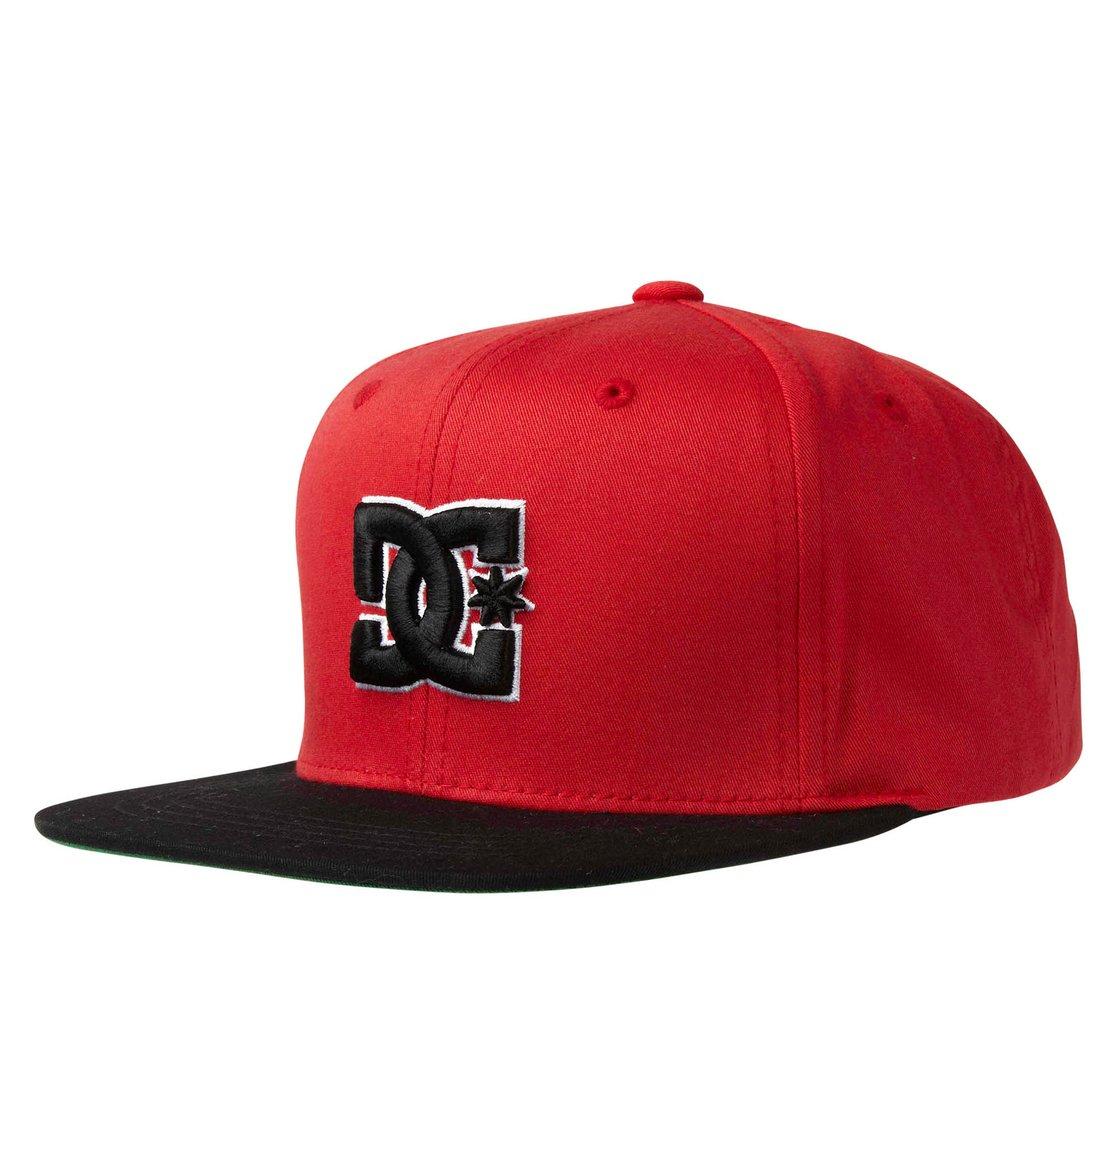 Kid snappy snapback hat adbha shoes jpg 1117x1173 Snapback hats dope for men 81428e6ef4f9